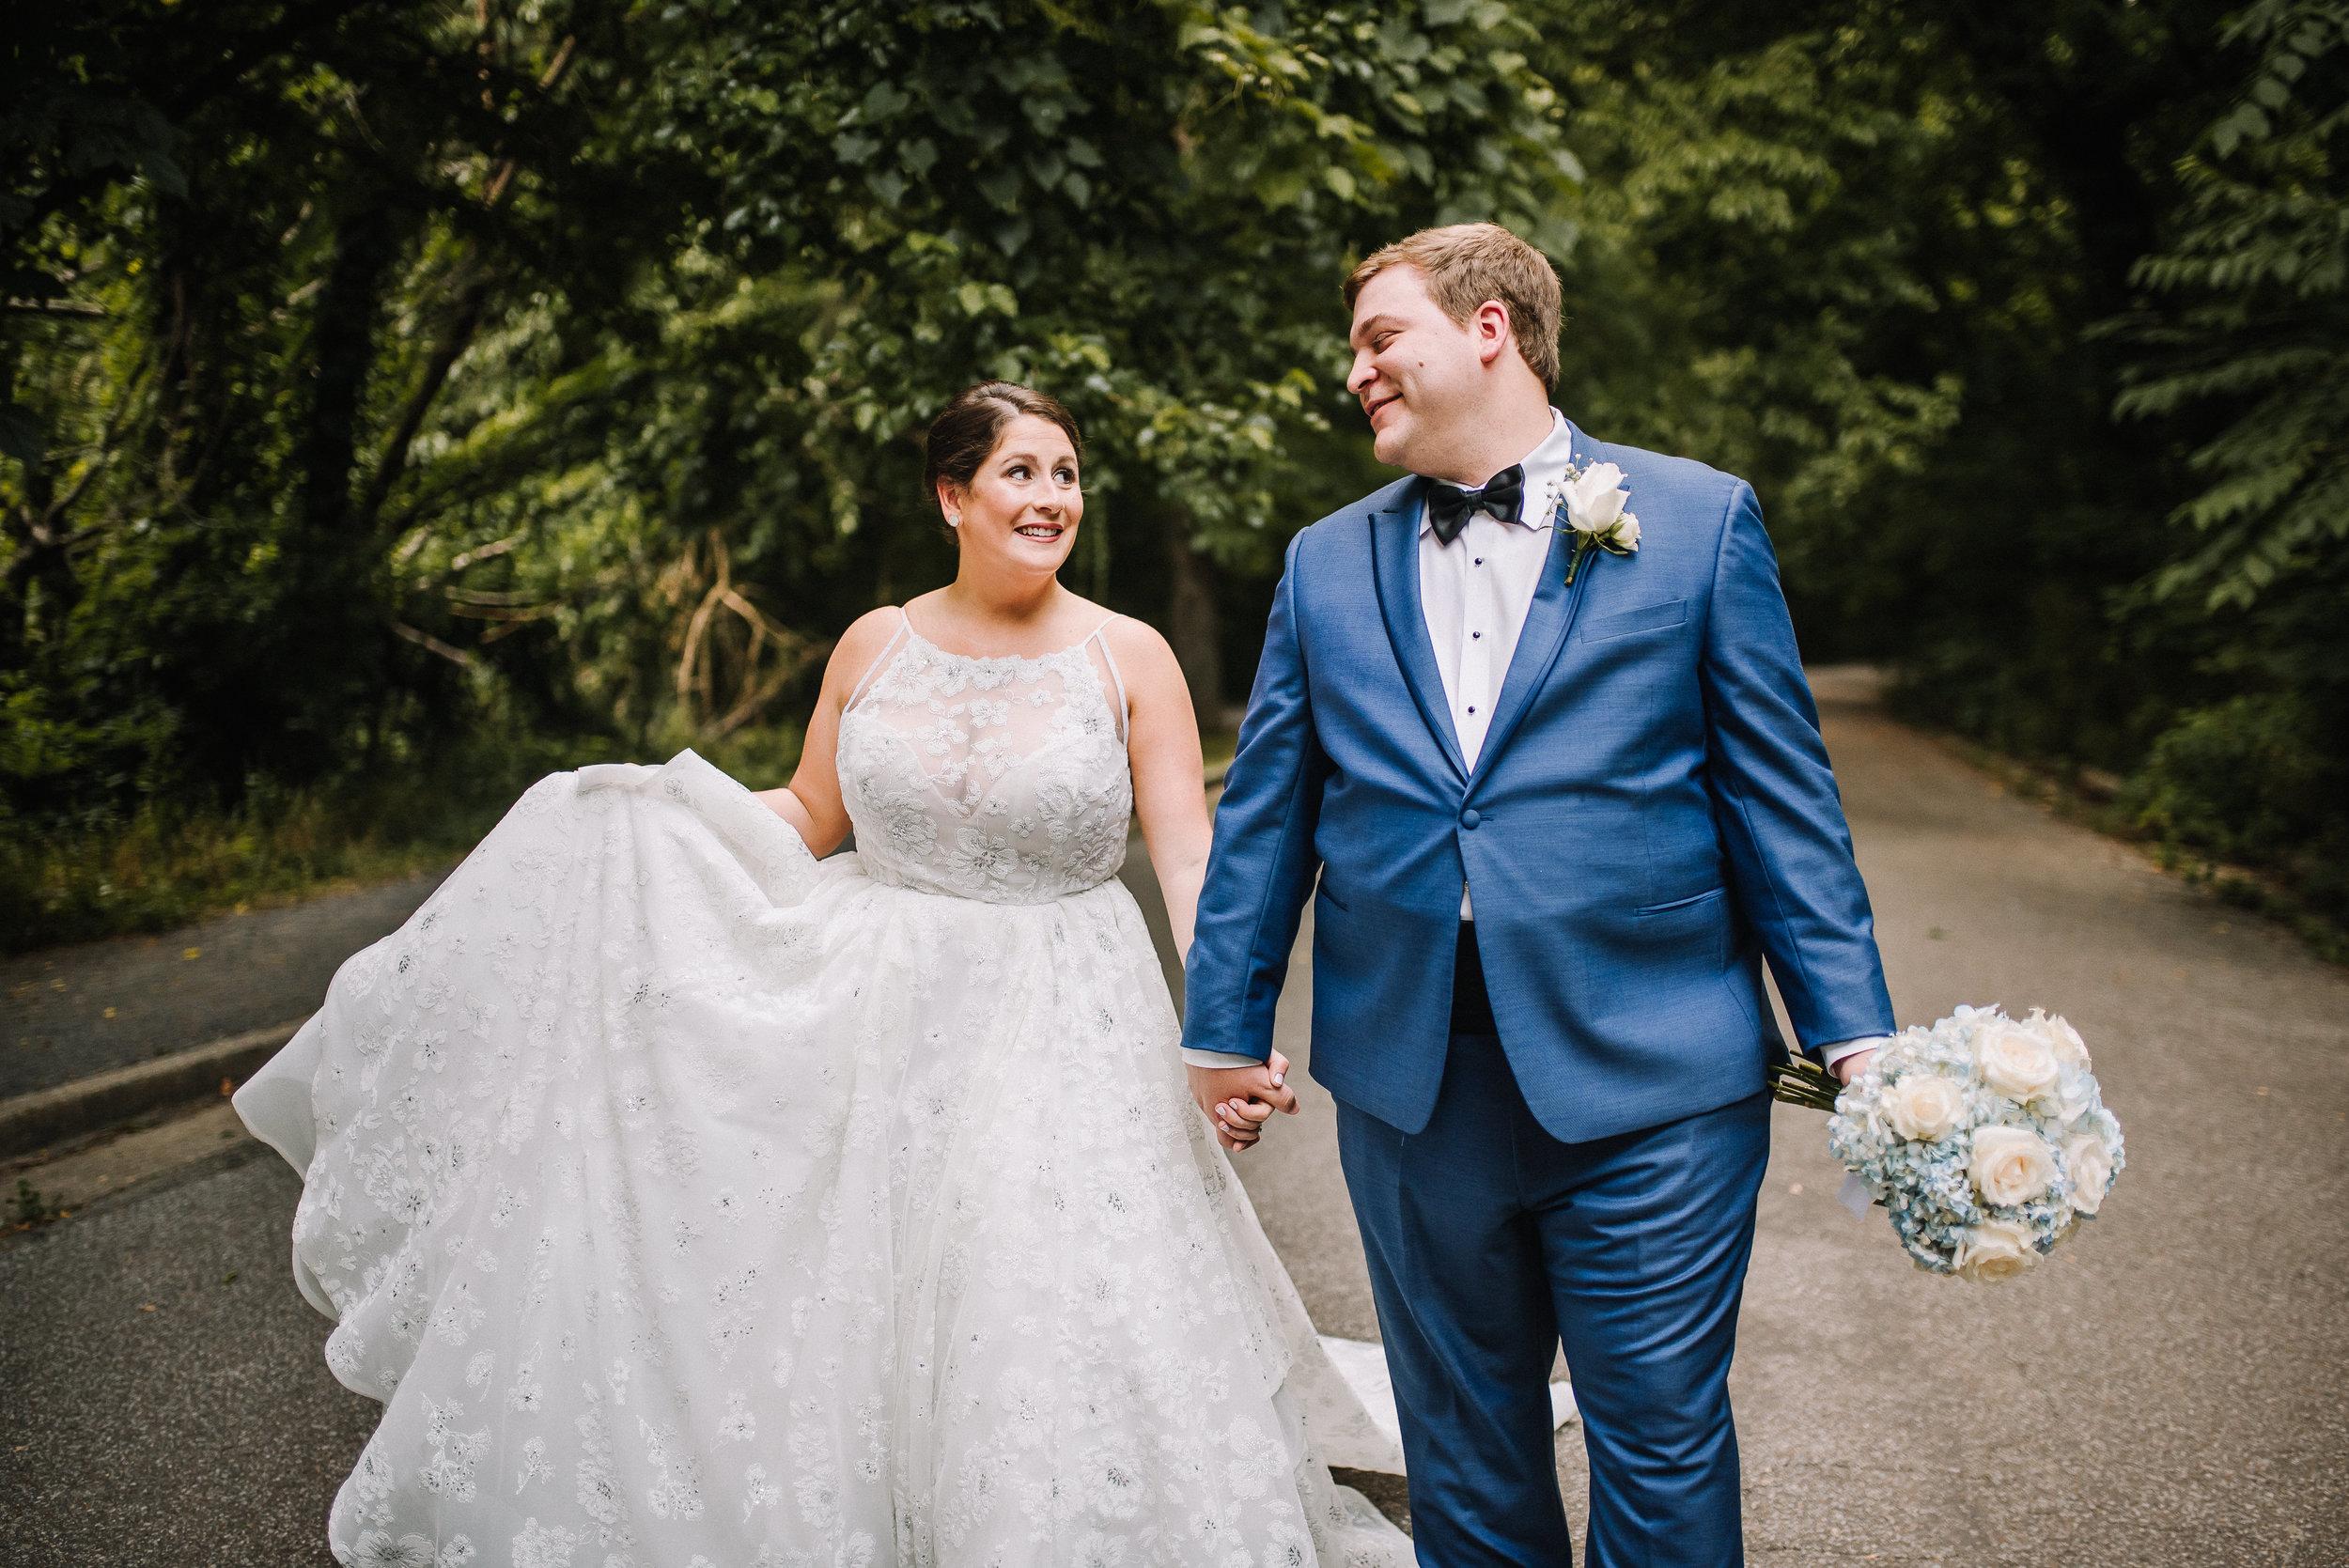 Smith Wedding_Memphis Zoo_Ashley Benham Photography-249.jpg